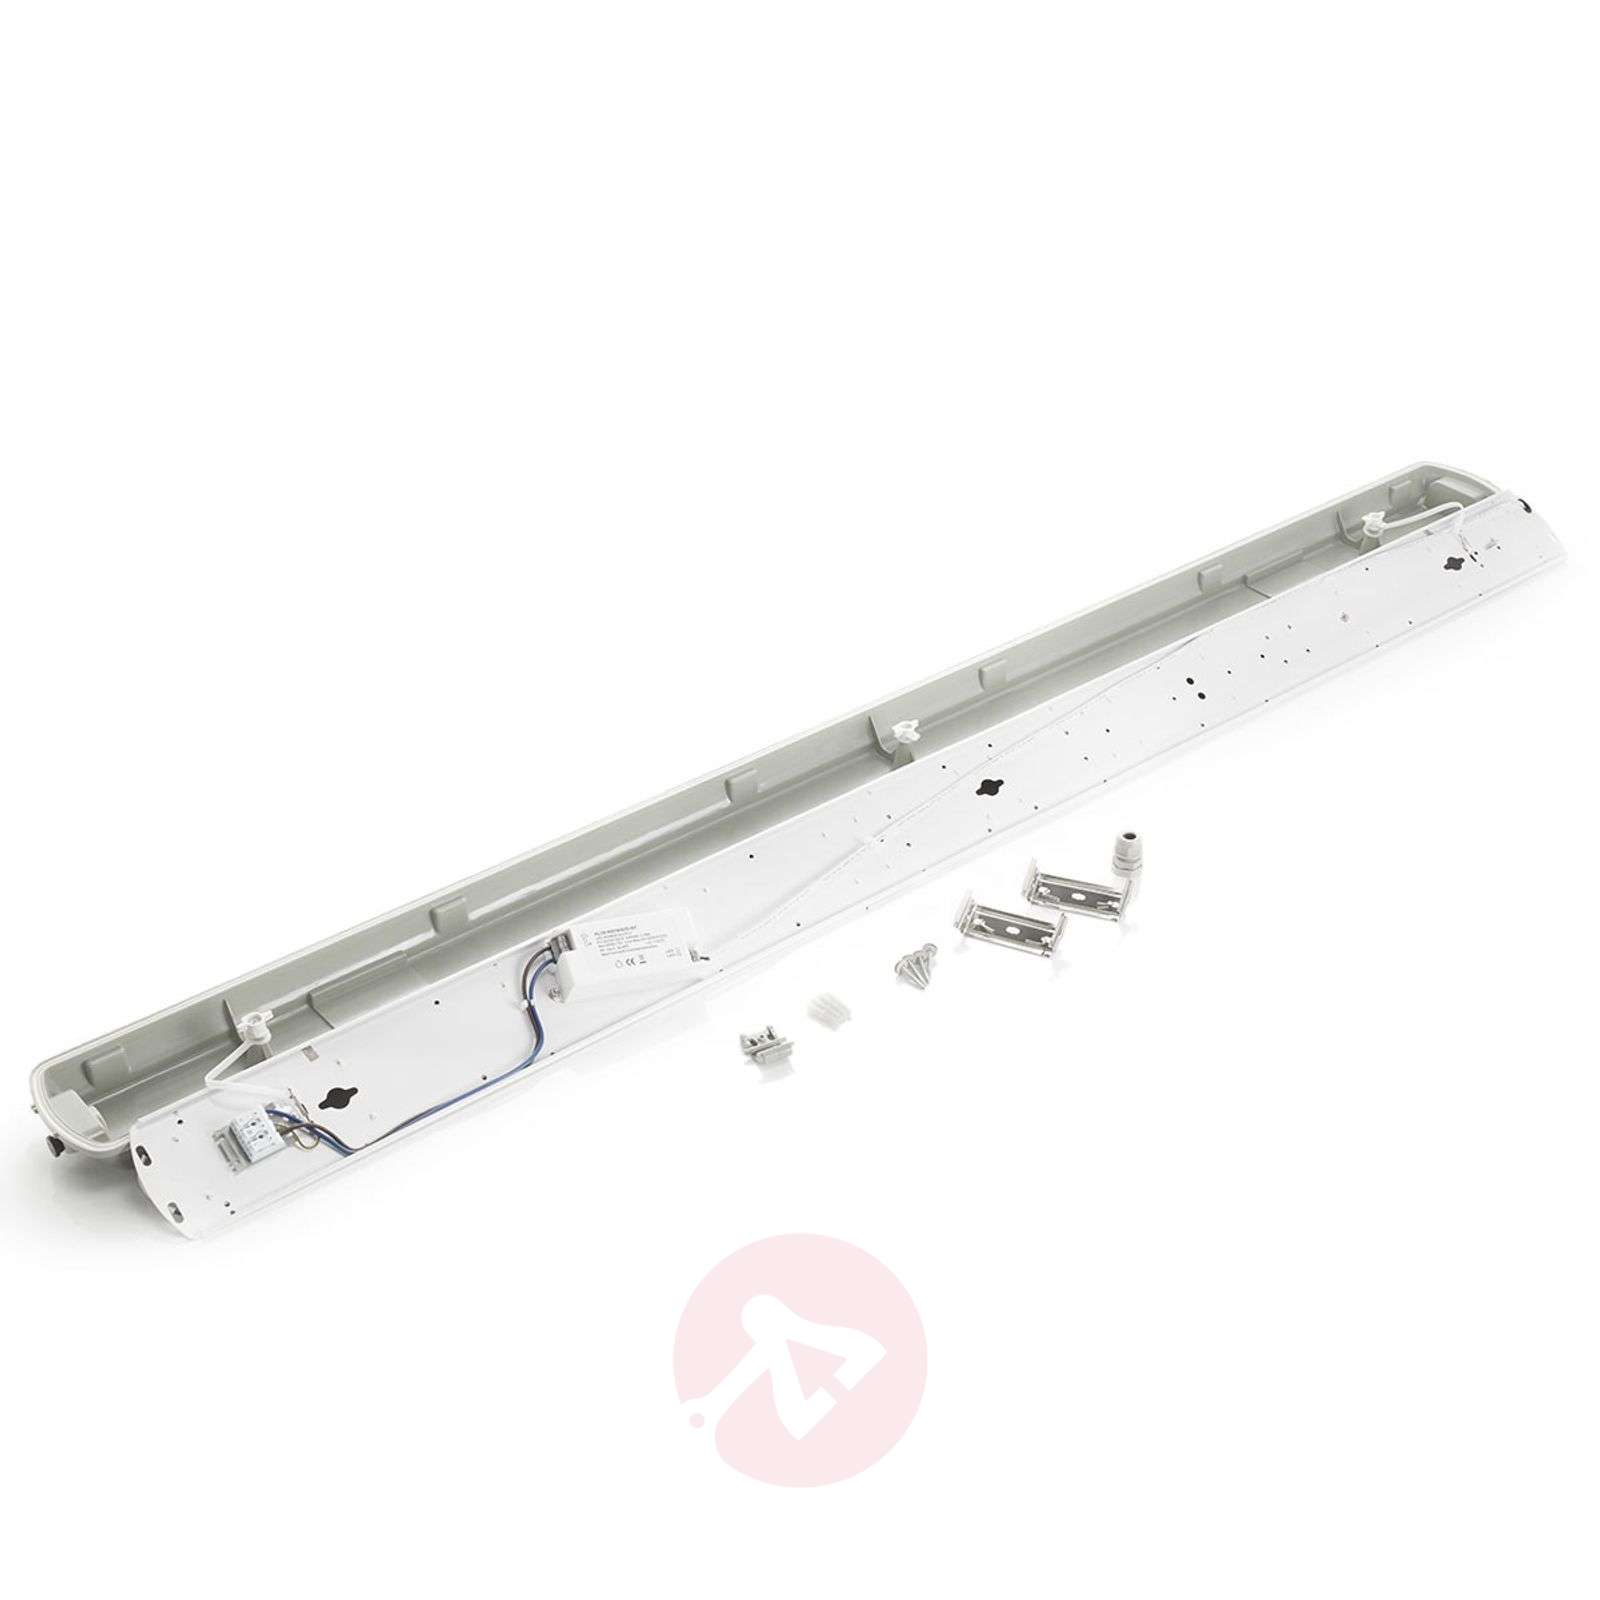 LED-kattovalaisin Mareen IP65 42,5 W 151,5 cm-9967032-02